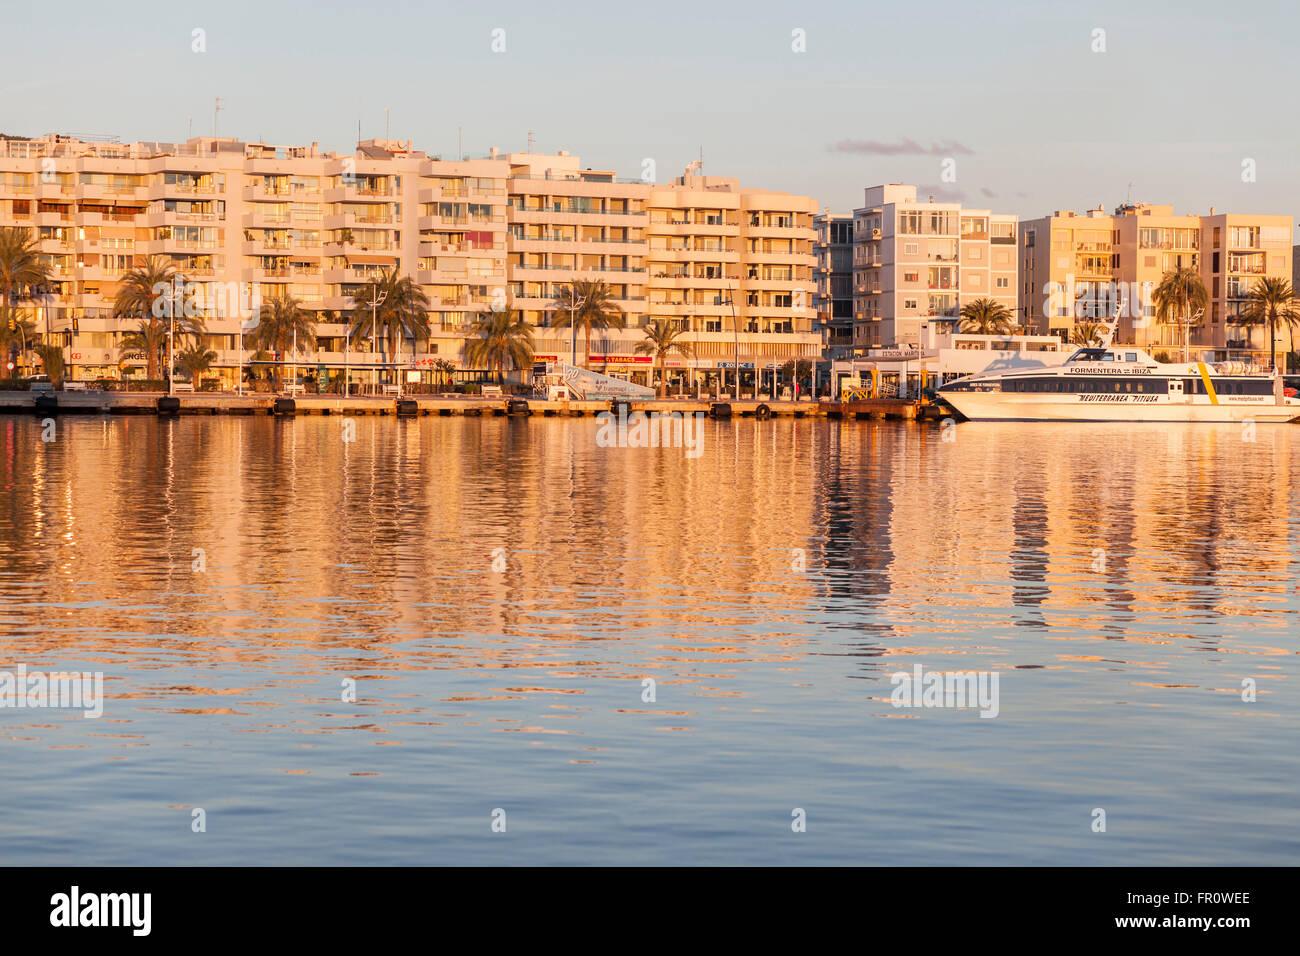 Ibiza-Eivissa,Balearic Islands,Spain. Stock Photo